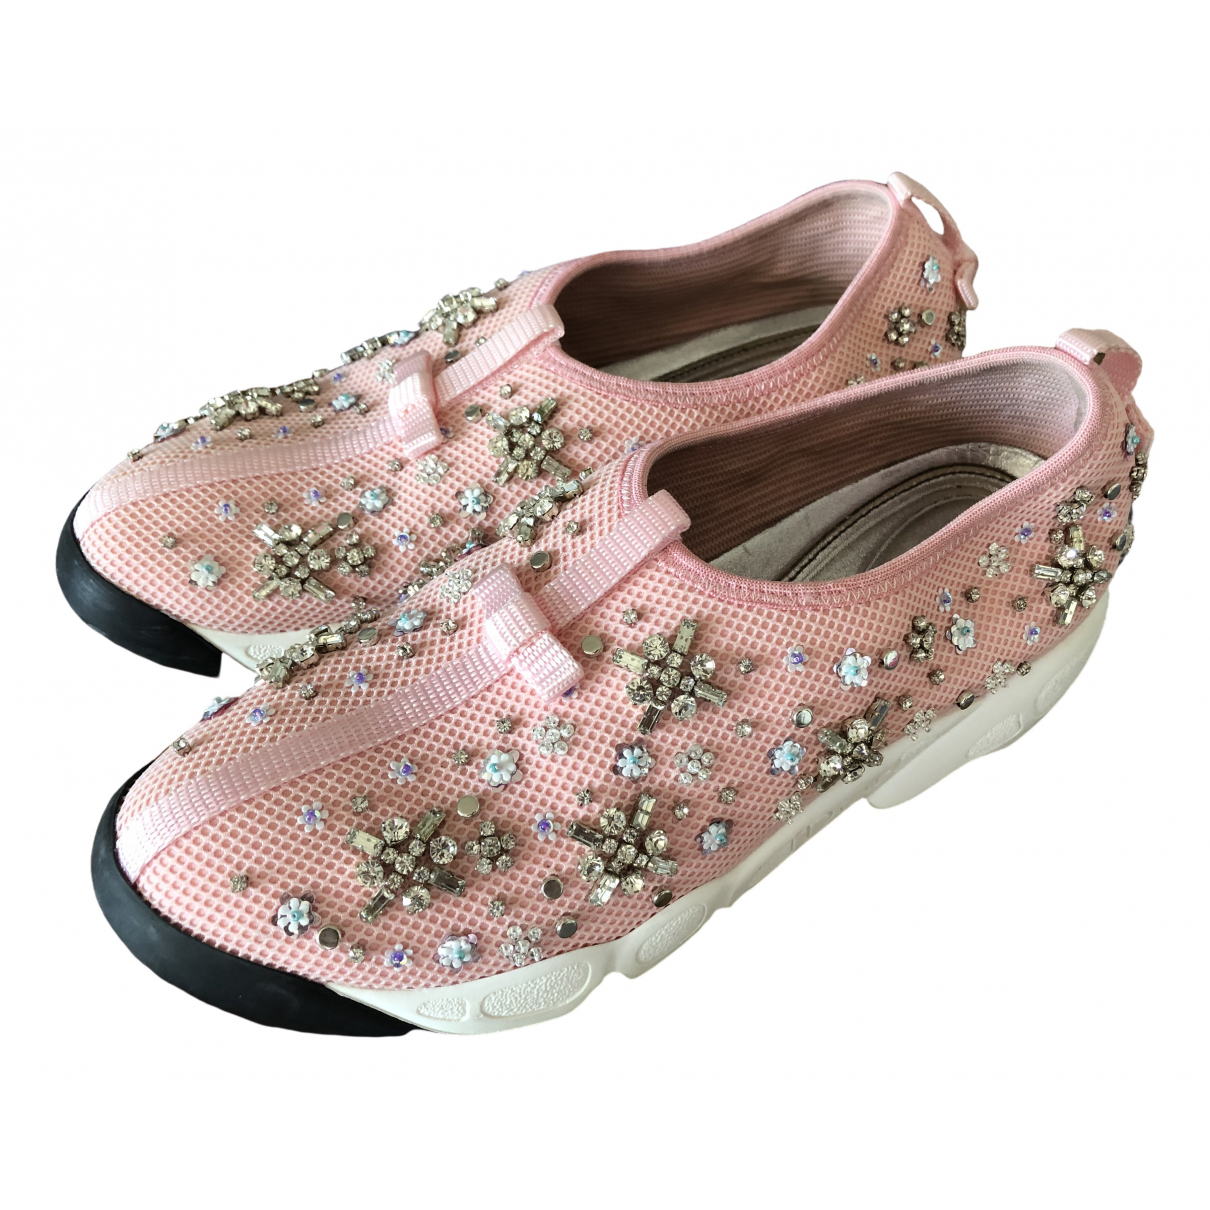 Dior Dior Fusion Pink Cloth Trainers for Women 38.5 EU